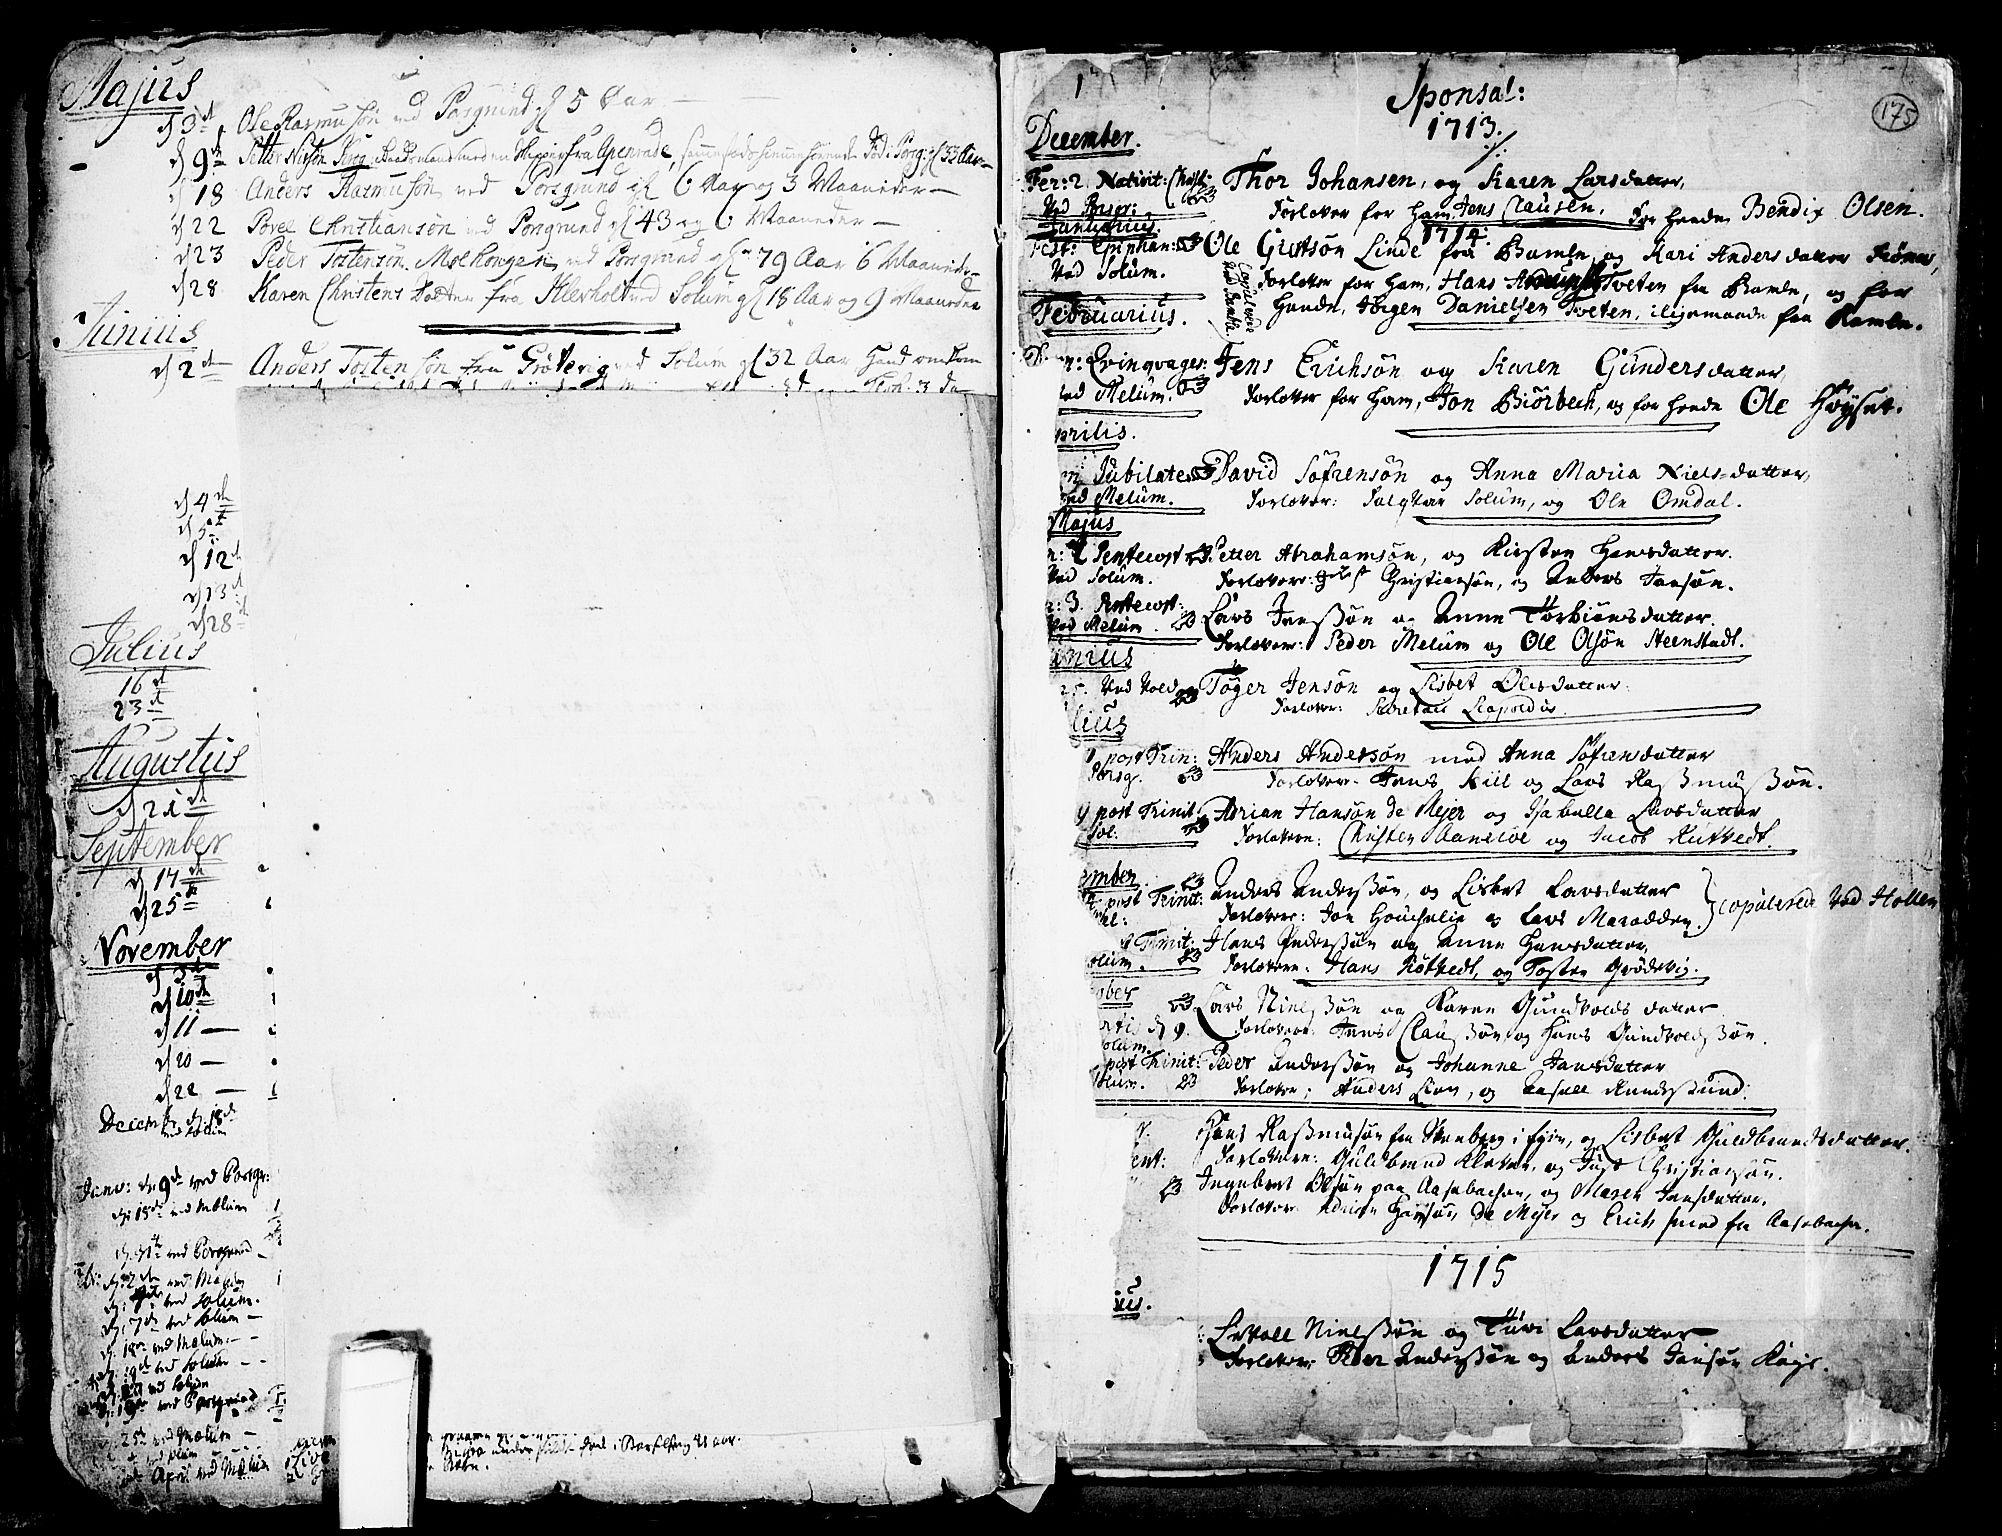 SAKO, Solum kirkebøker, F/Fa/L0002: Ministerialbok nr. I 2, 1713-1761, s. 175